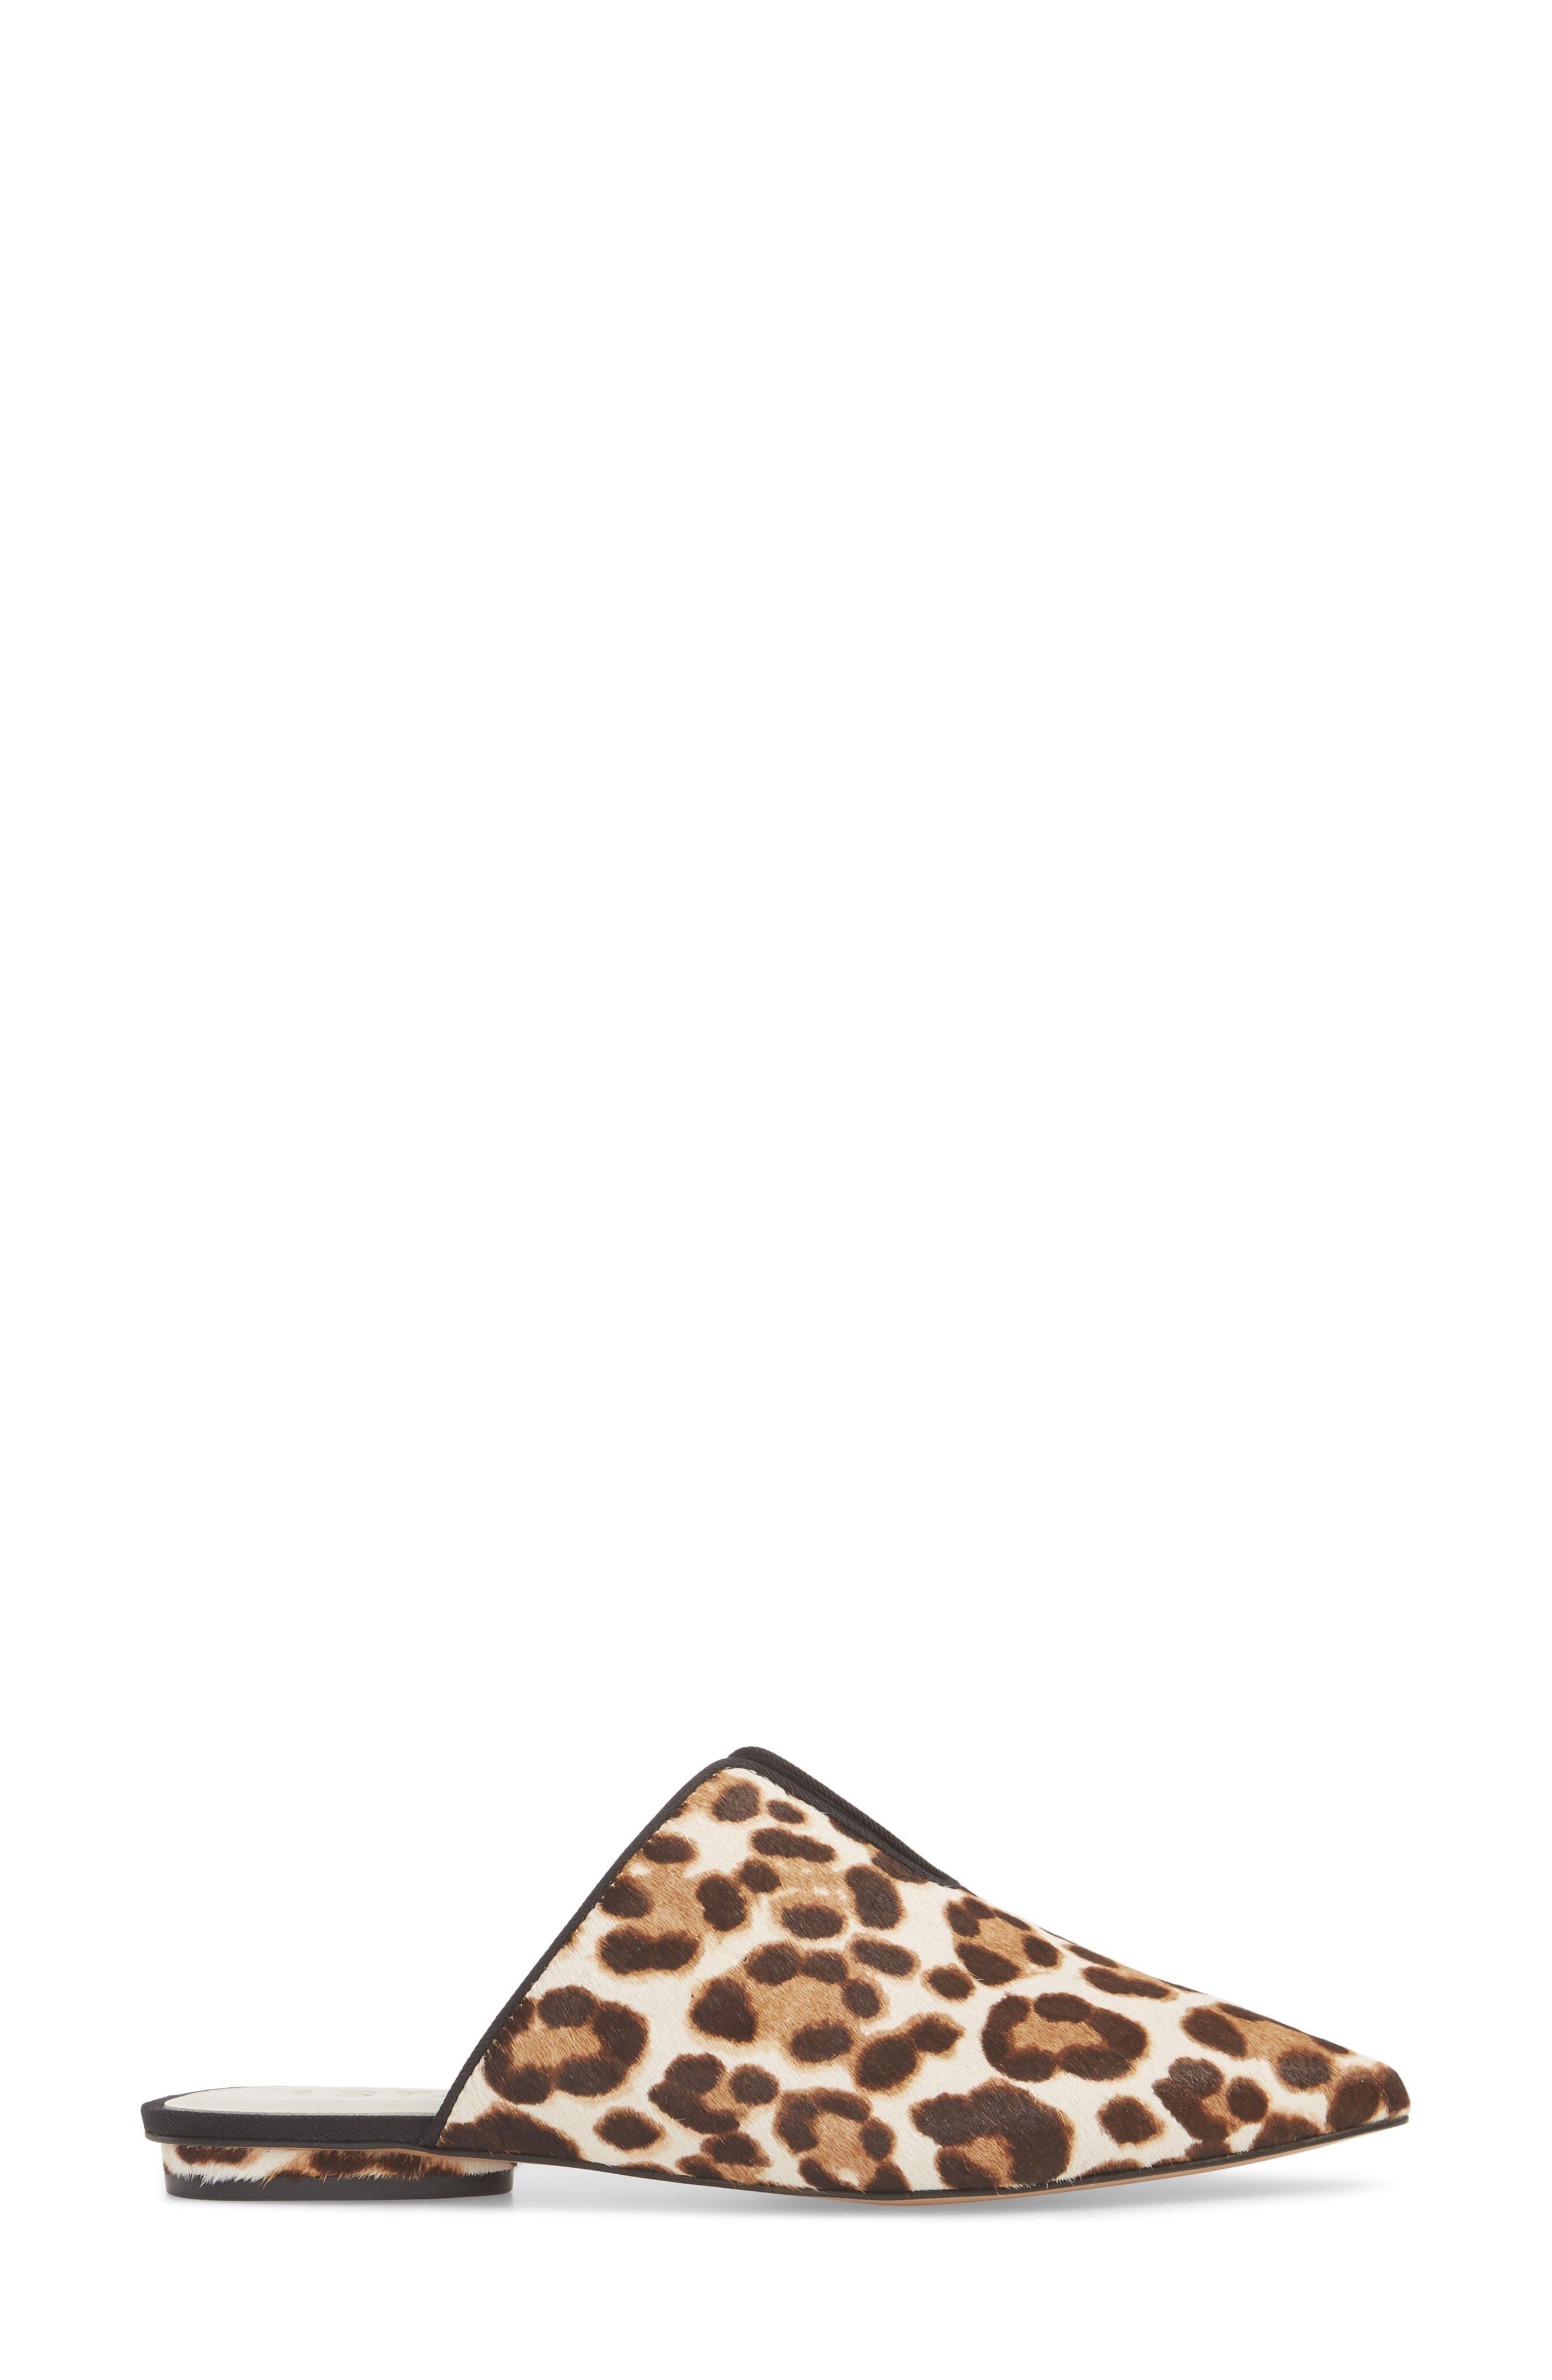 Genia Genuine Calf Hair Mule,                             Alternate thumbnail 3, color,                             Cheetah/ Black Calf Hair